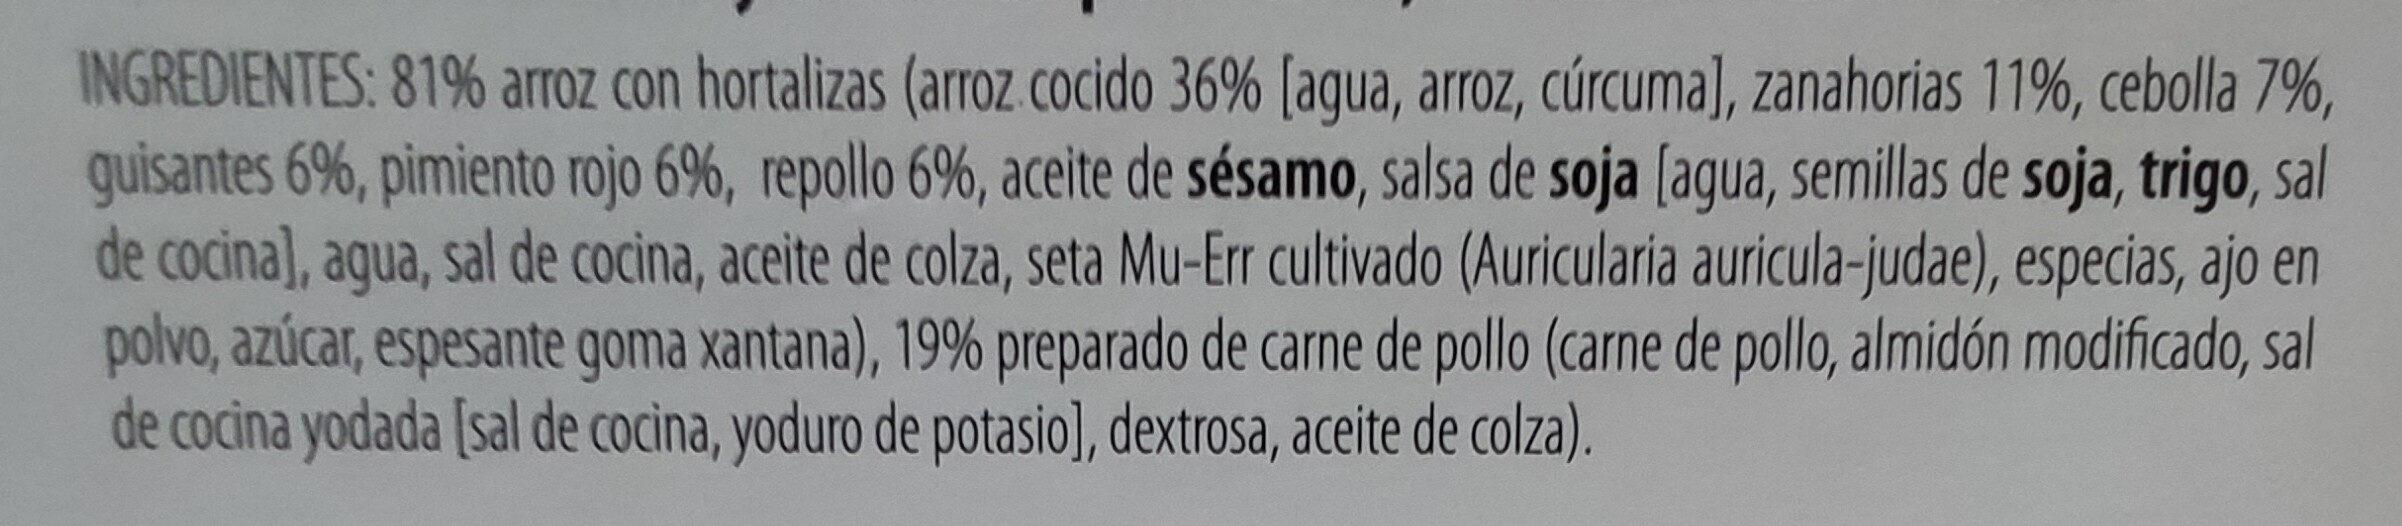 Nasi Goreng con carne de pollo frita - Ingredients - es